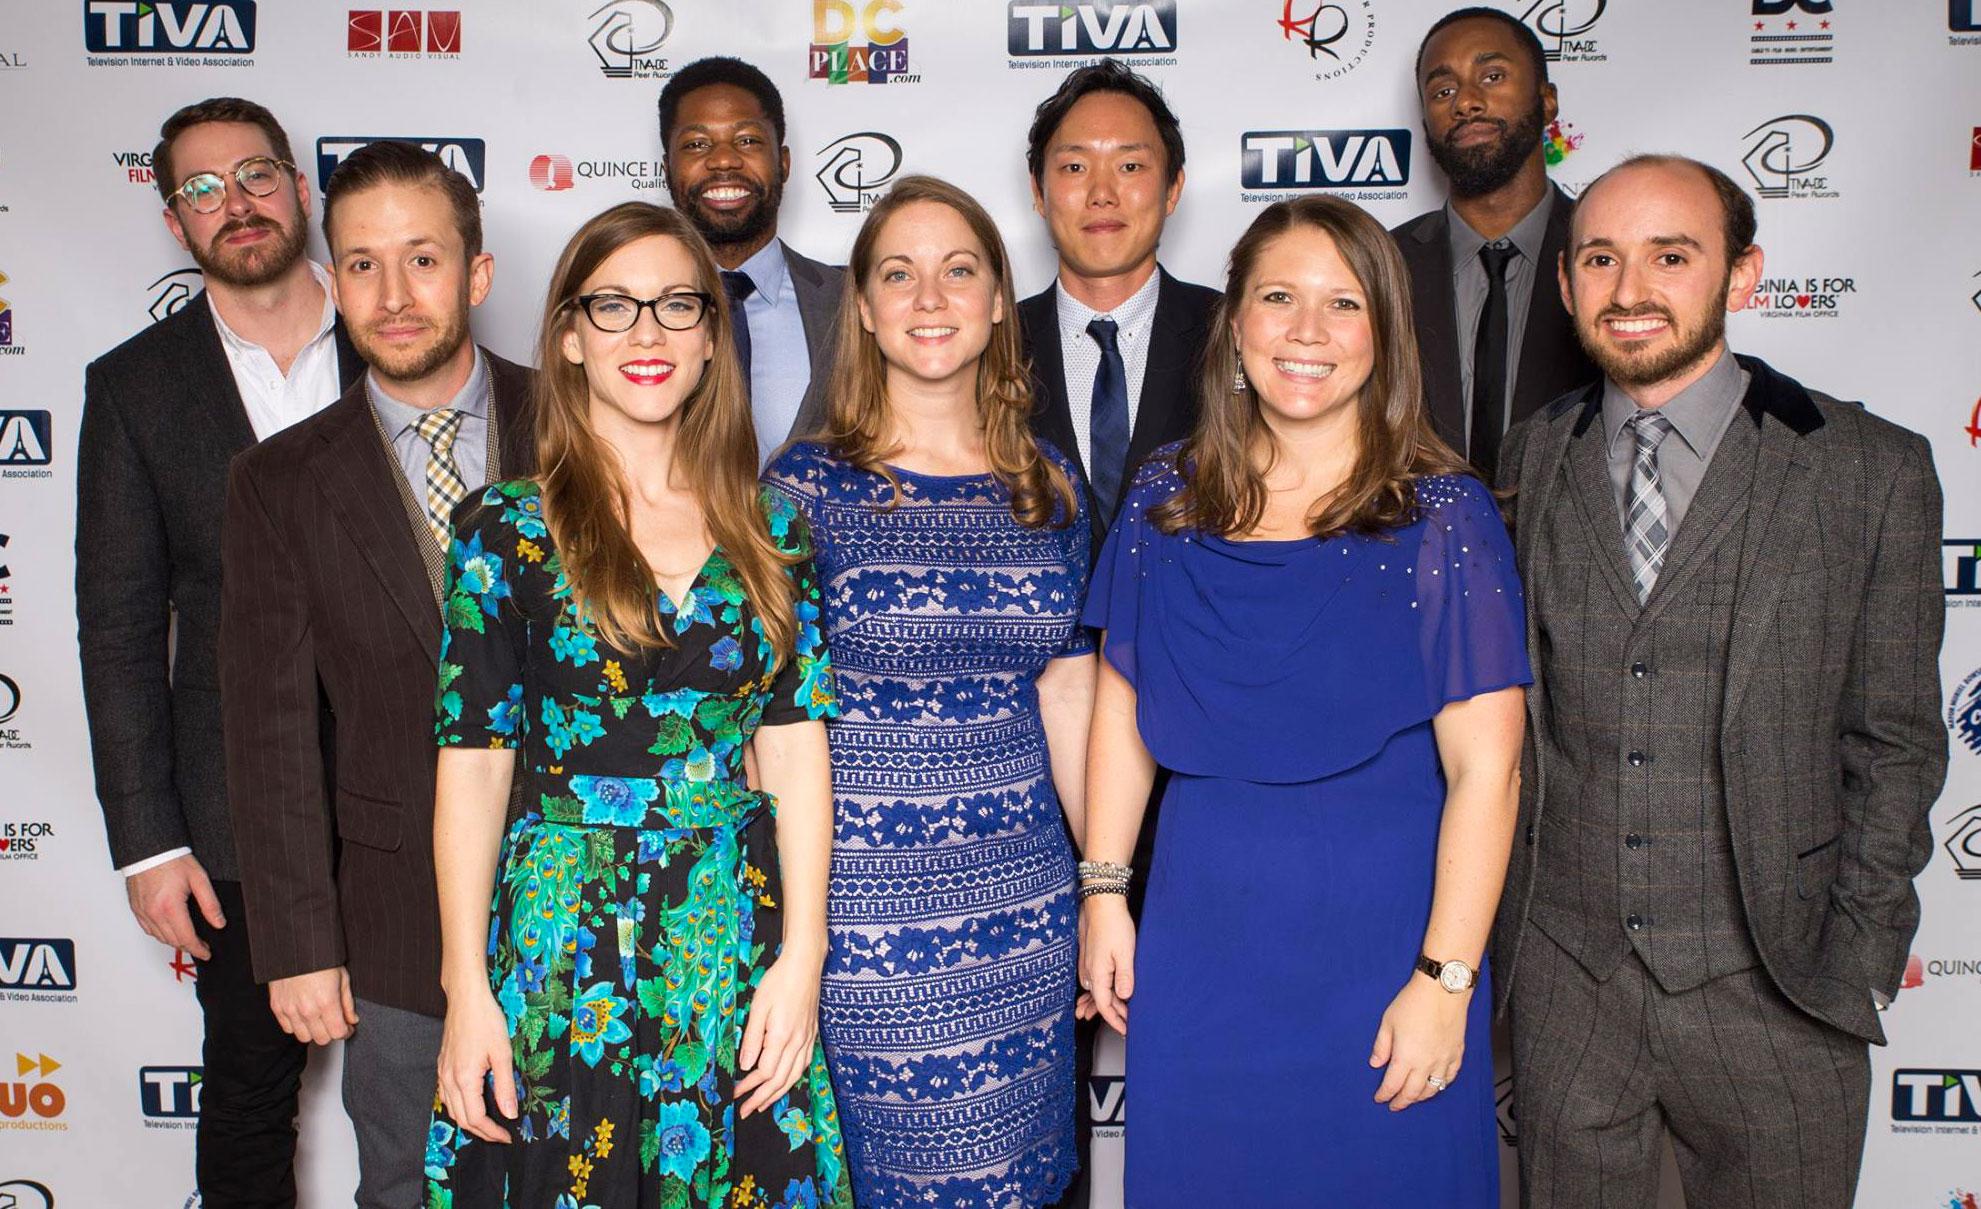 LAI-Video-2017-TIVA-Peer-Awards.jpg